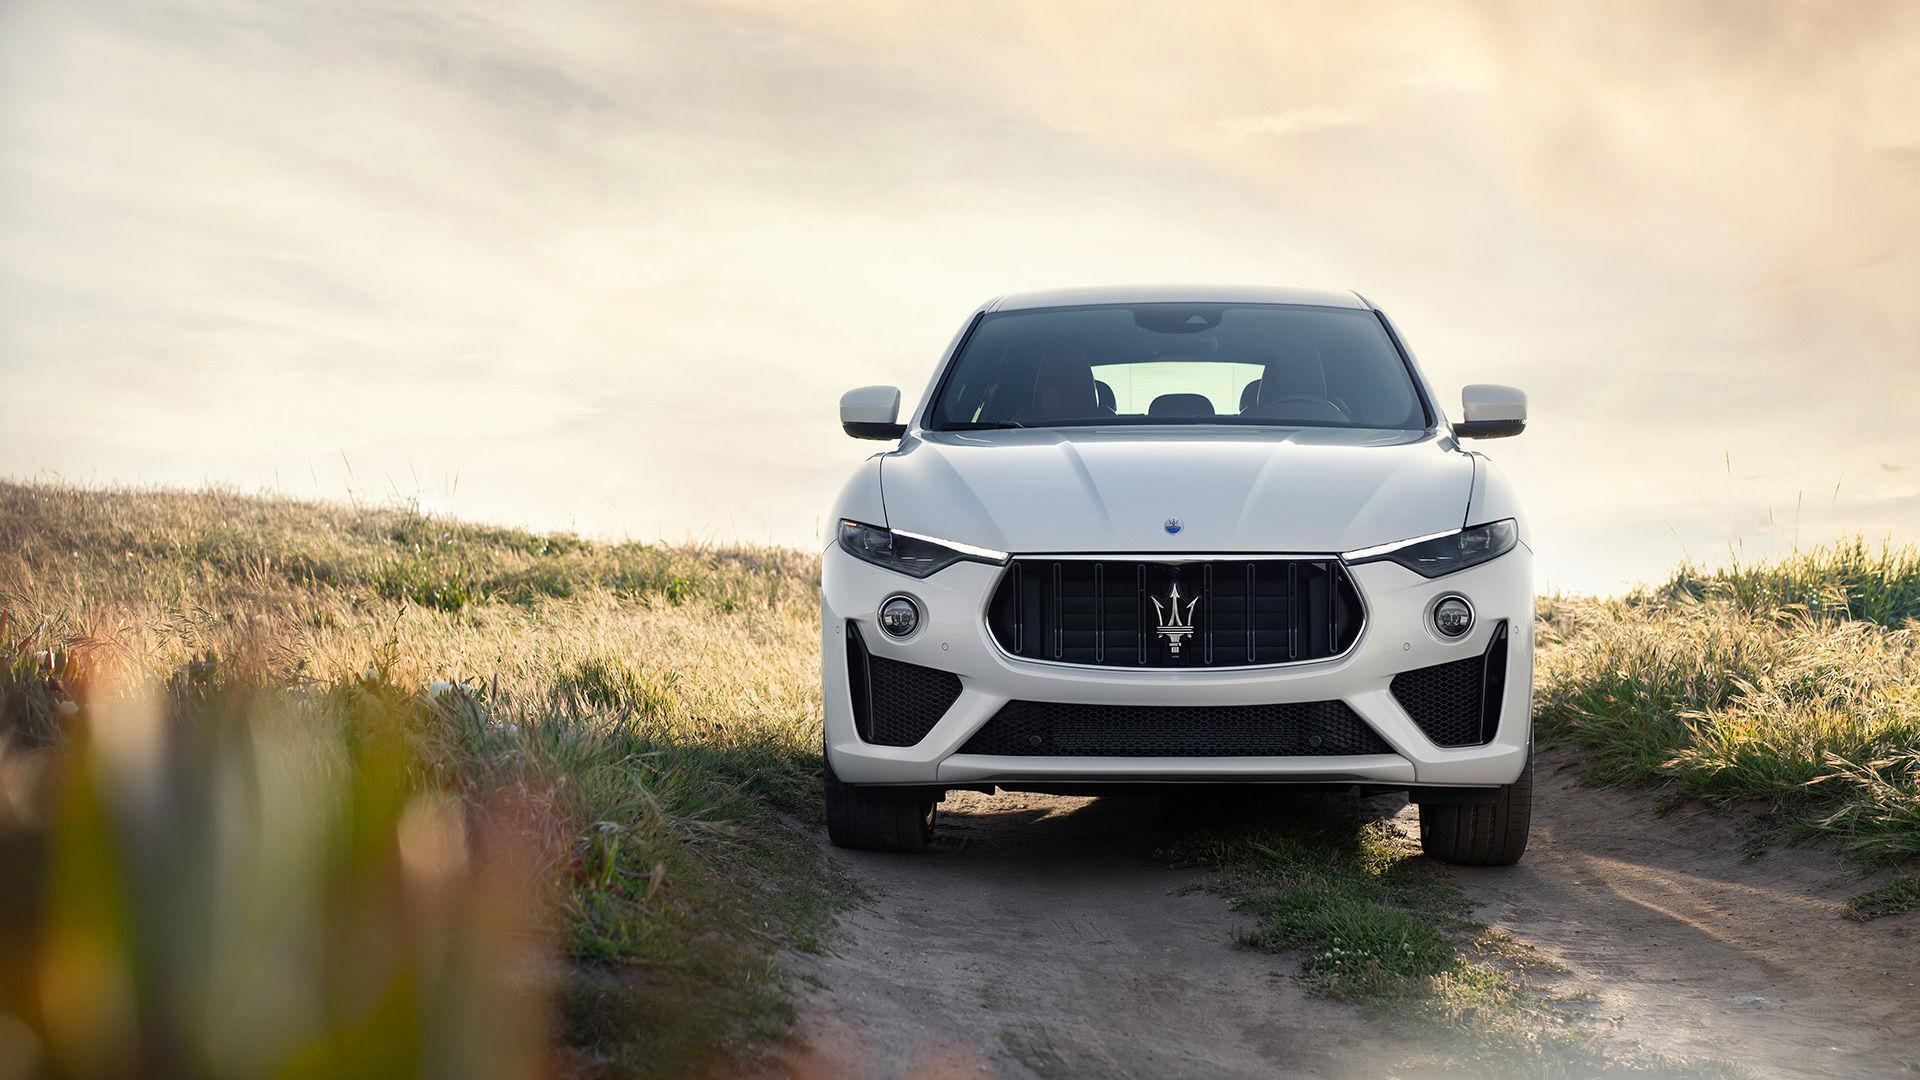 White Maserati Levante on the road - Side view